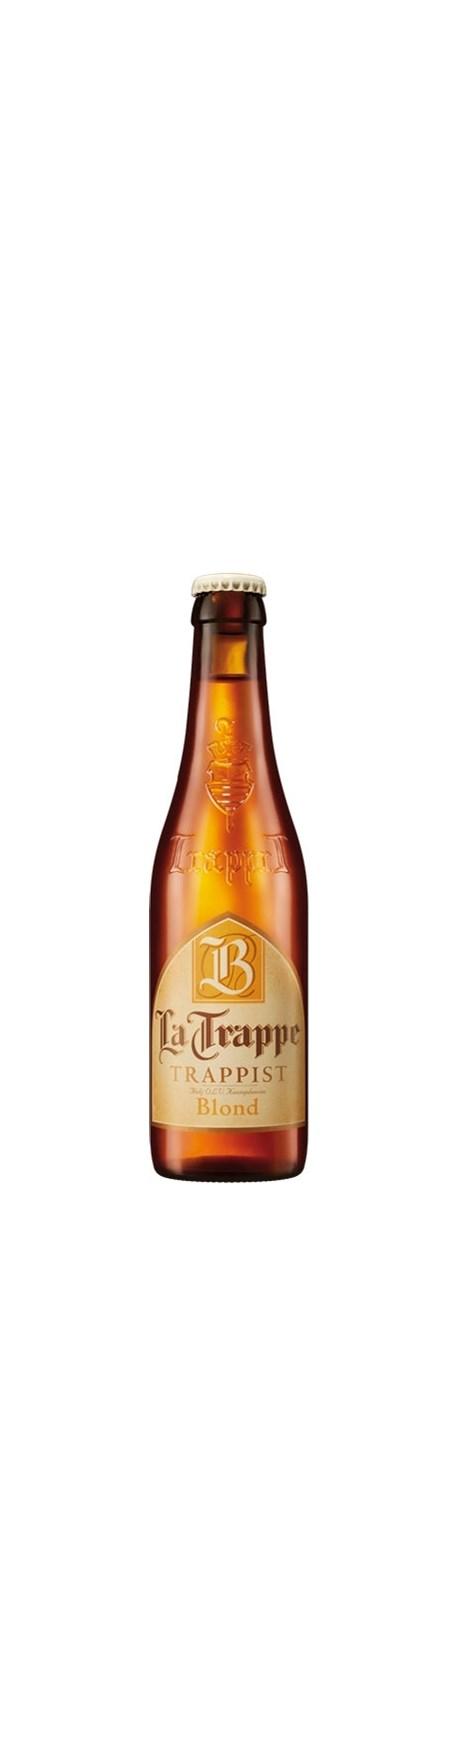 La Trappe Blond 330ml